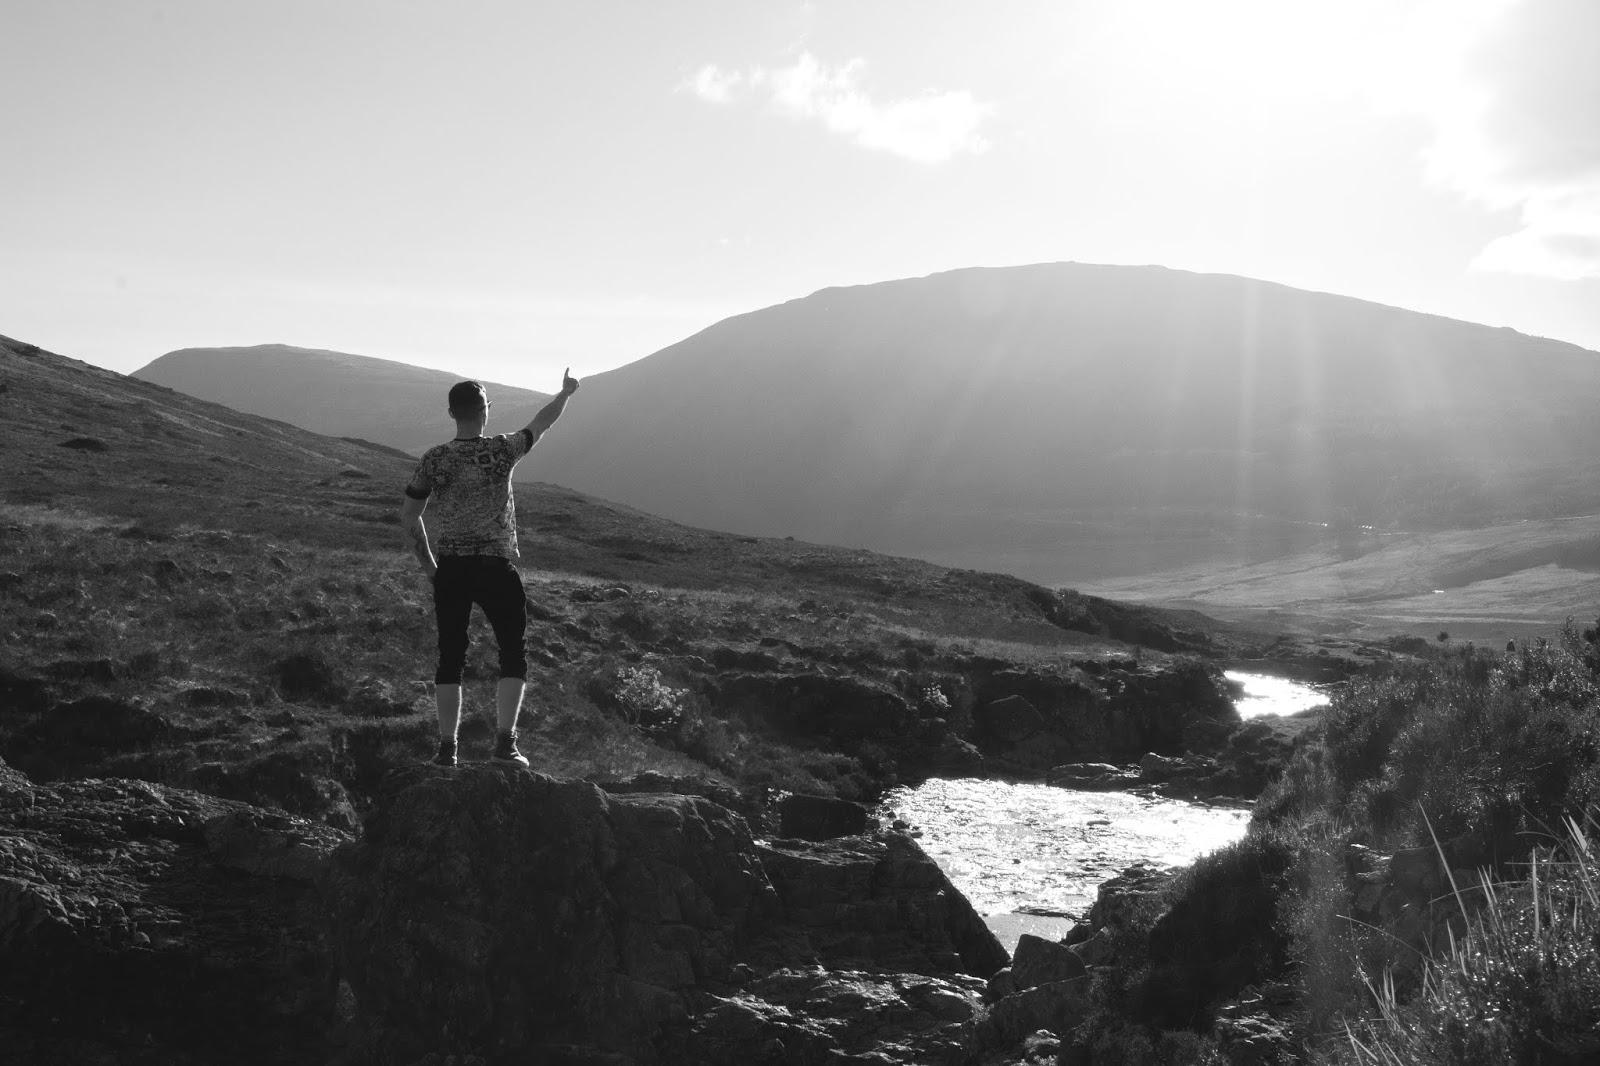 Isle of Skye - Part 1